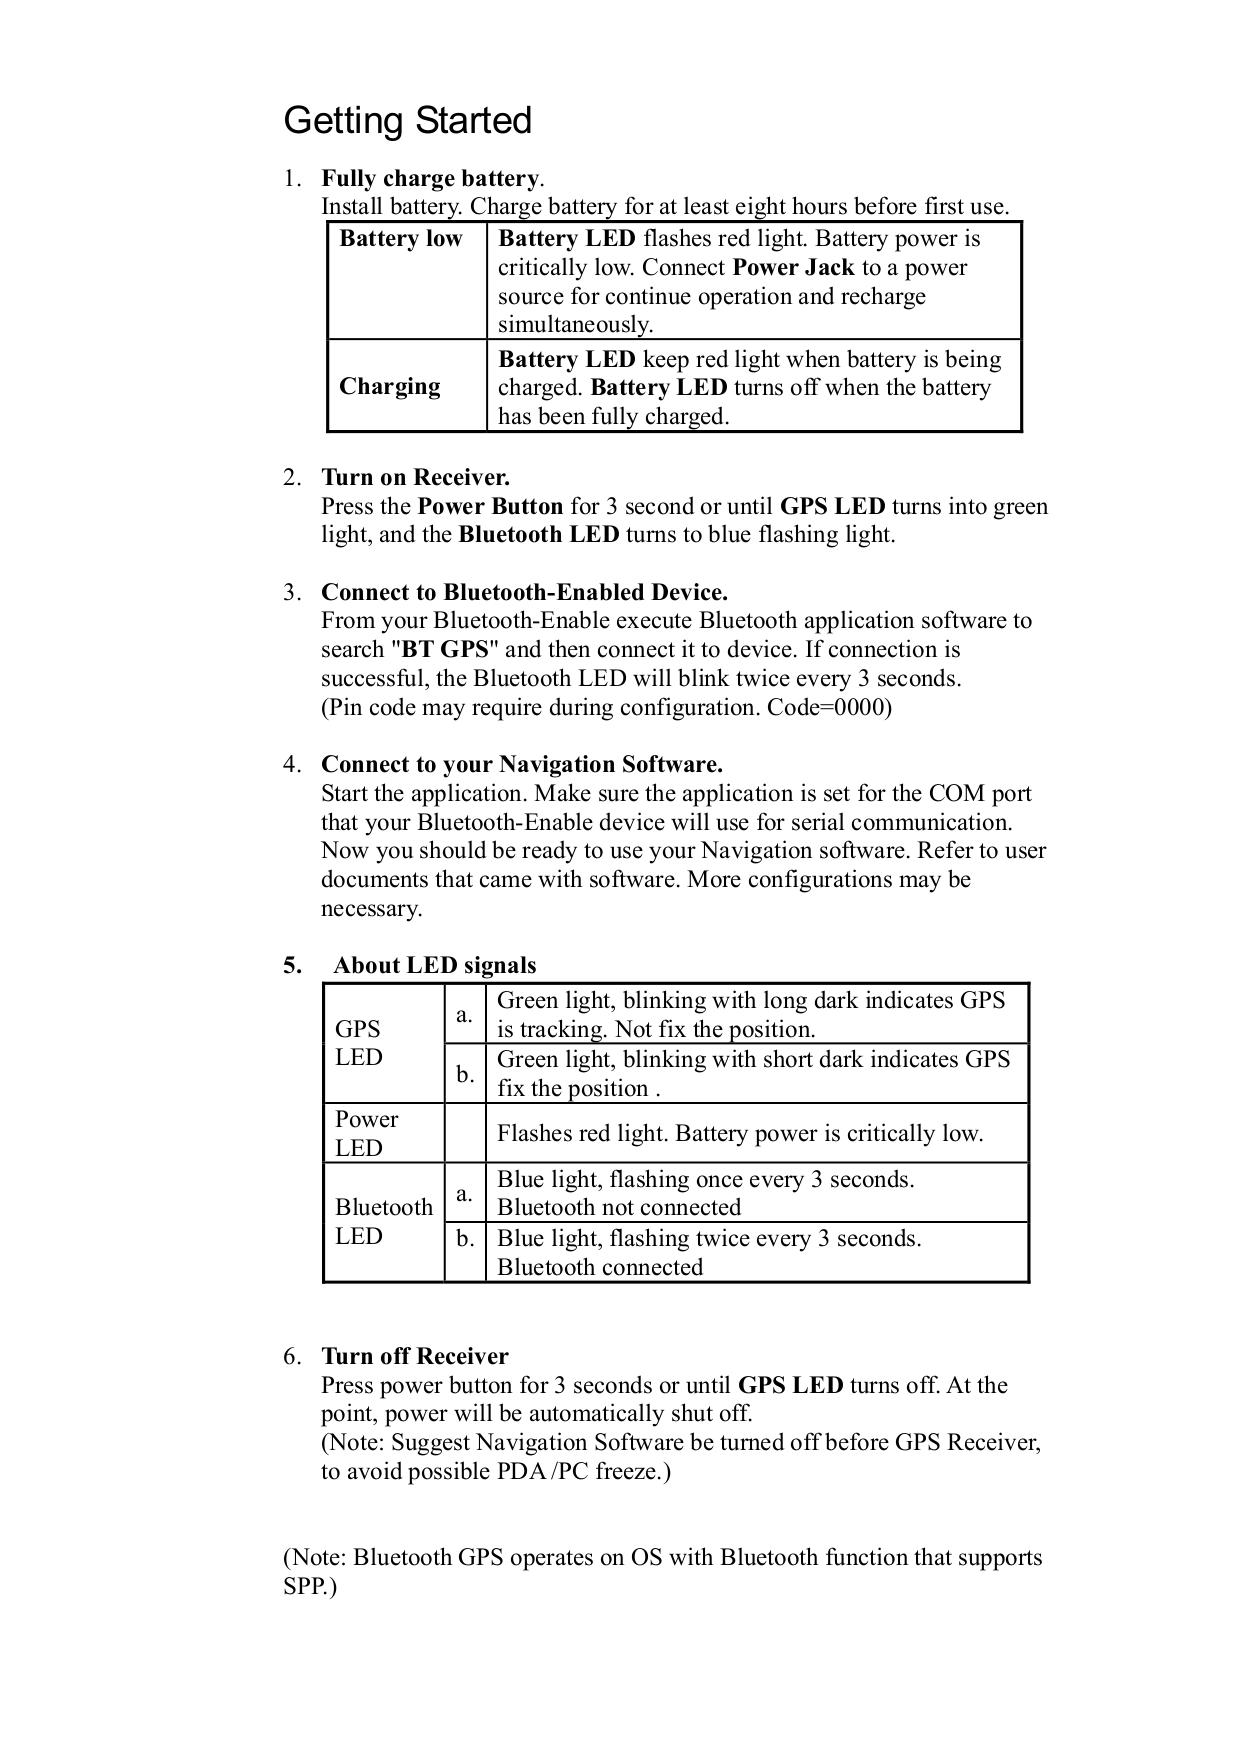 PDF manual for HP PDA iPAQ h4150